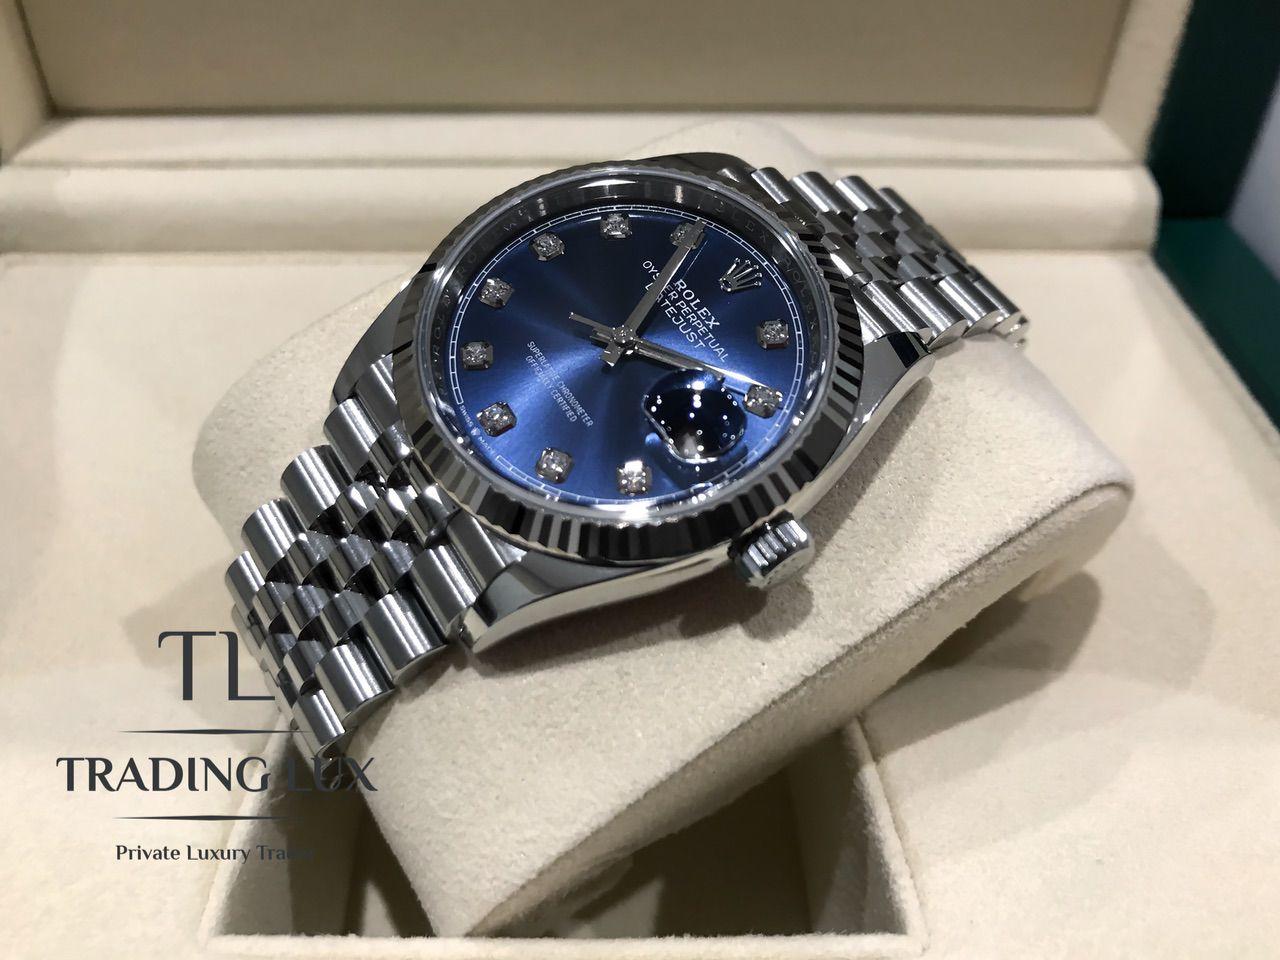 Rolex-Datejust-126234-1